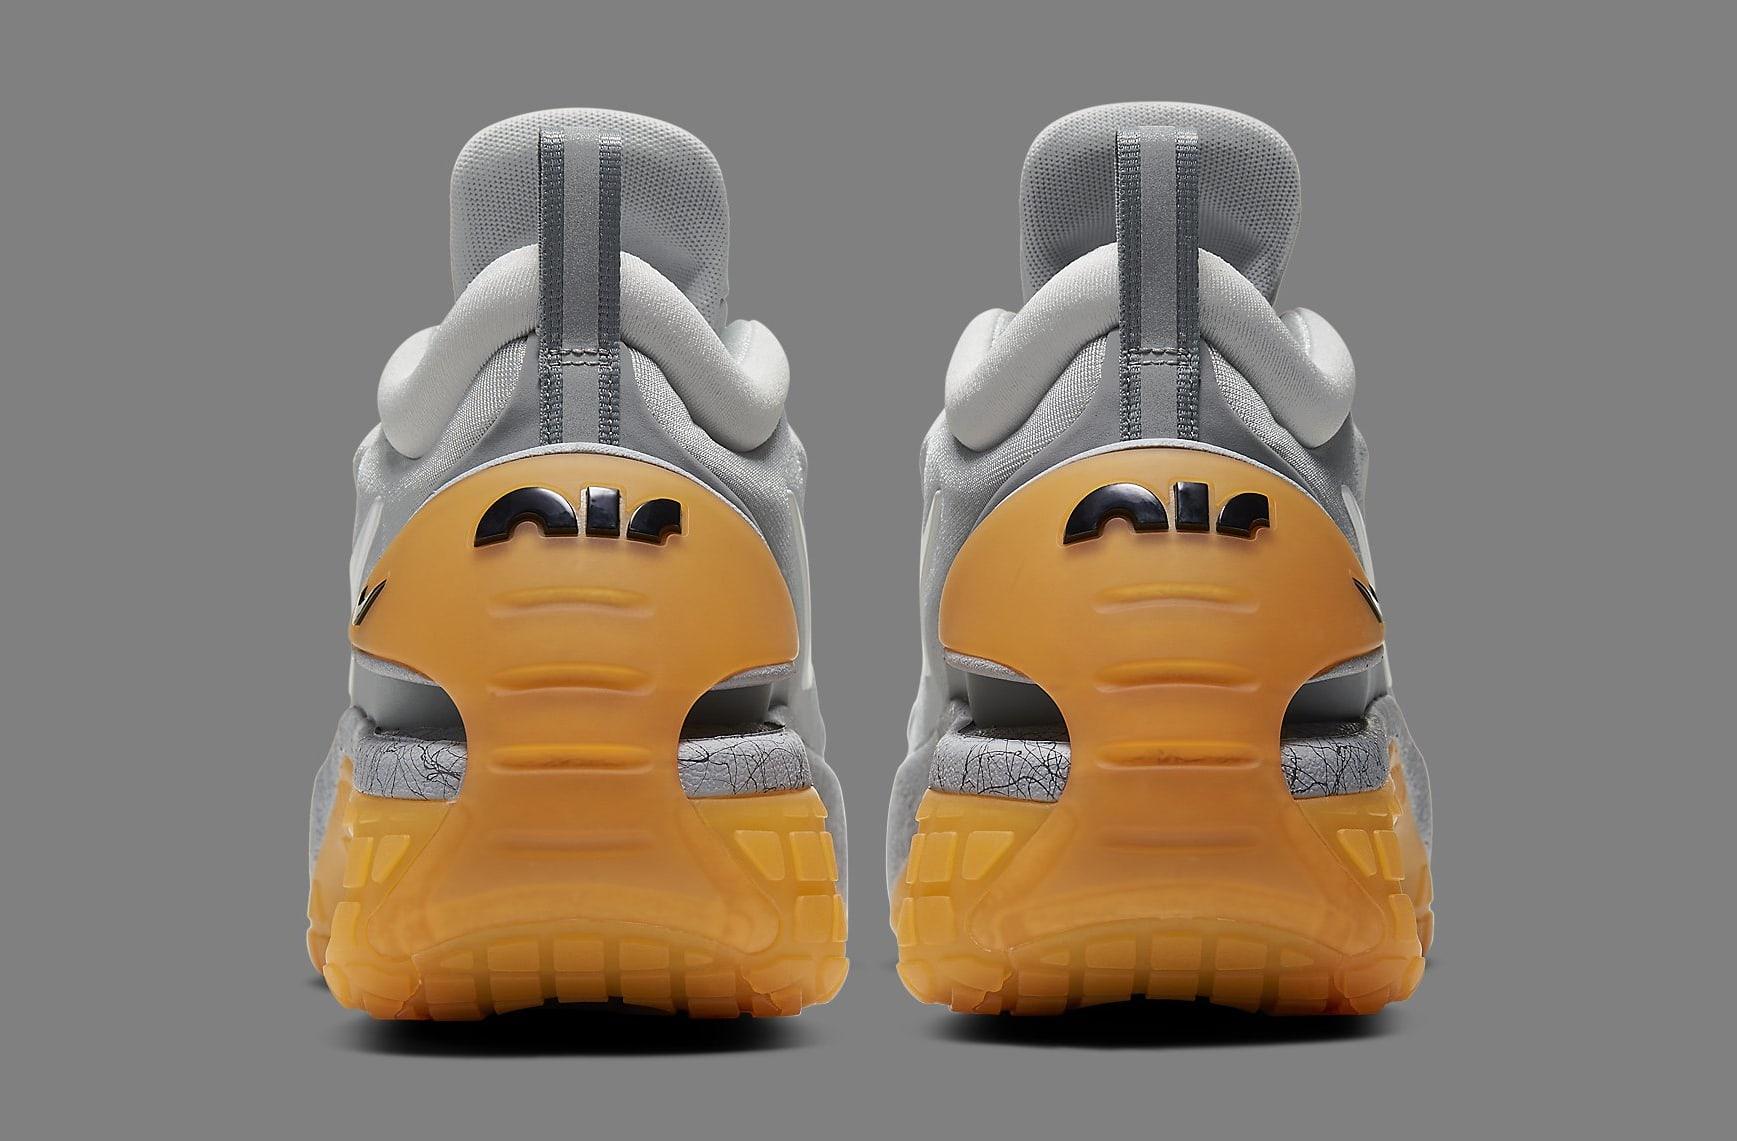 Nike Adapt LE 01 'Grey Gum' CW7304-001 Heel